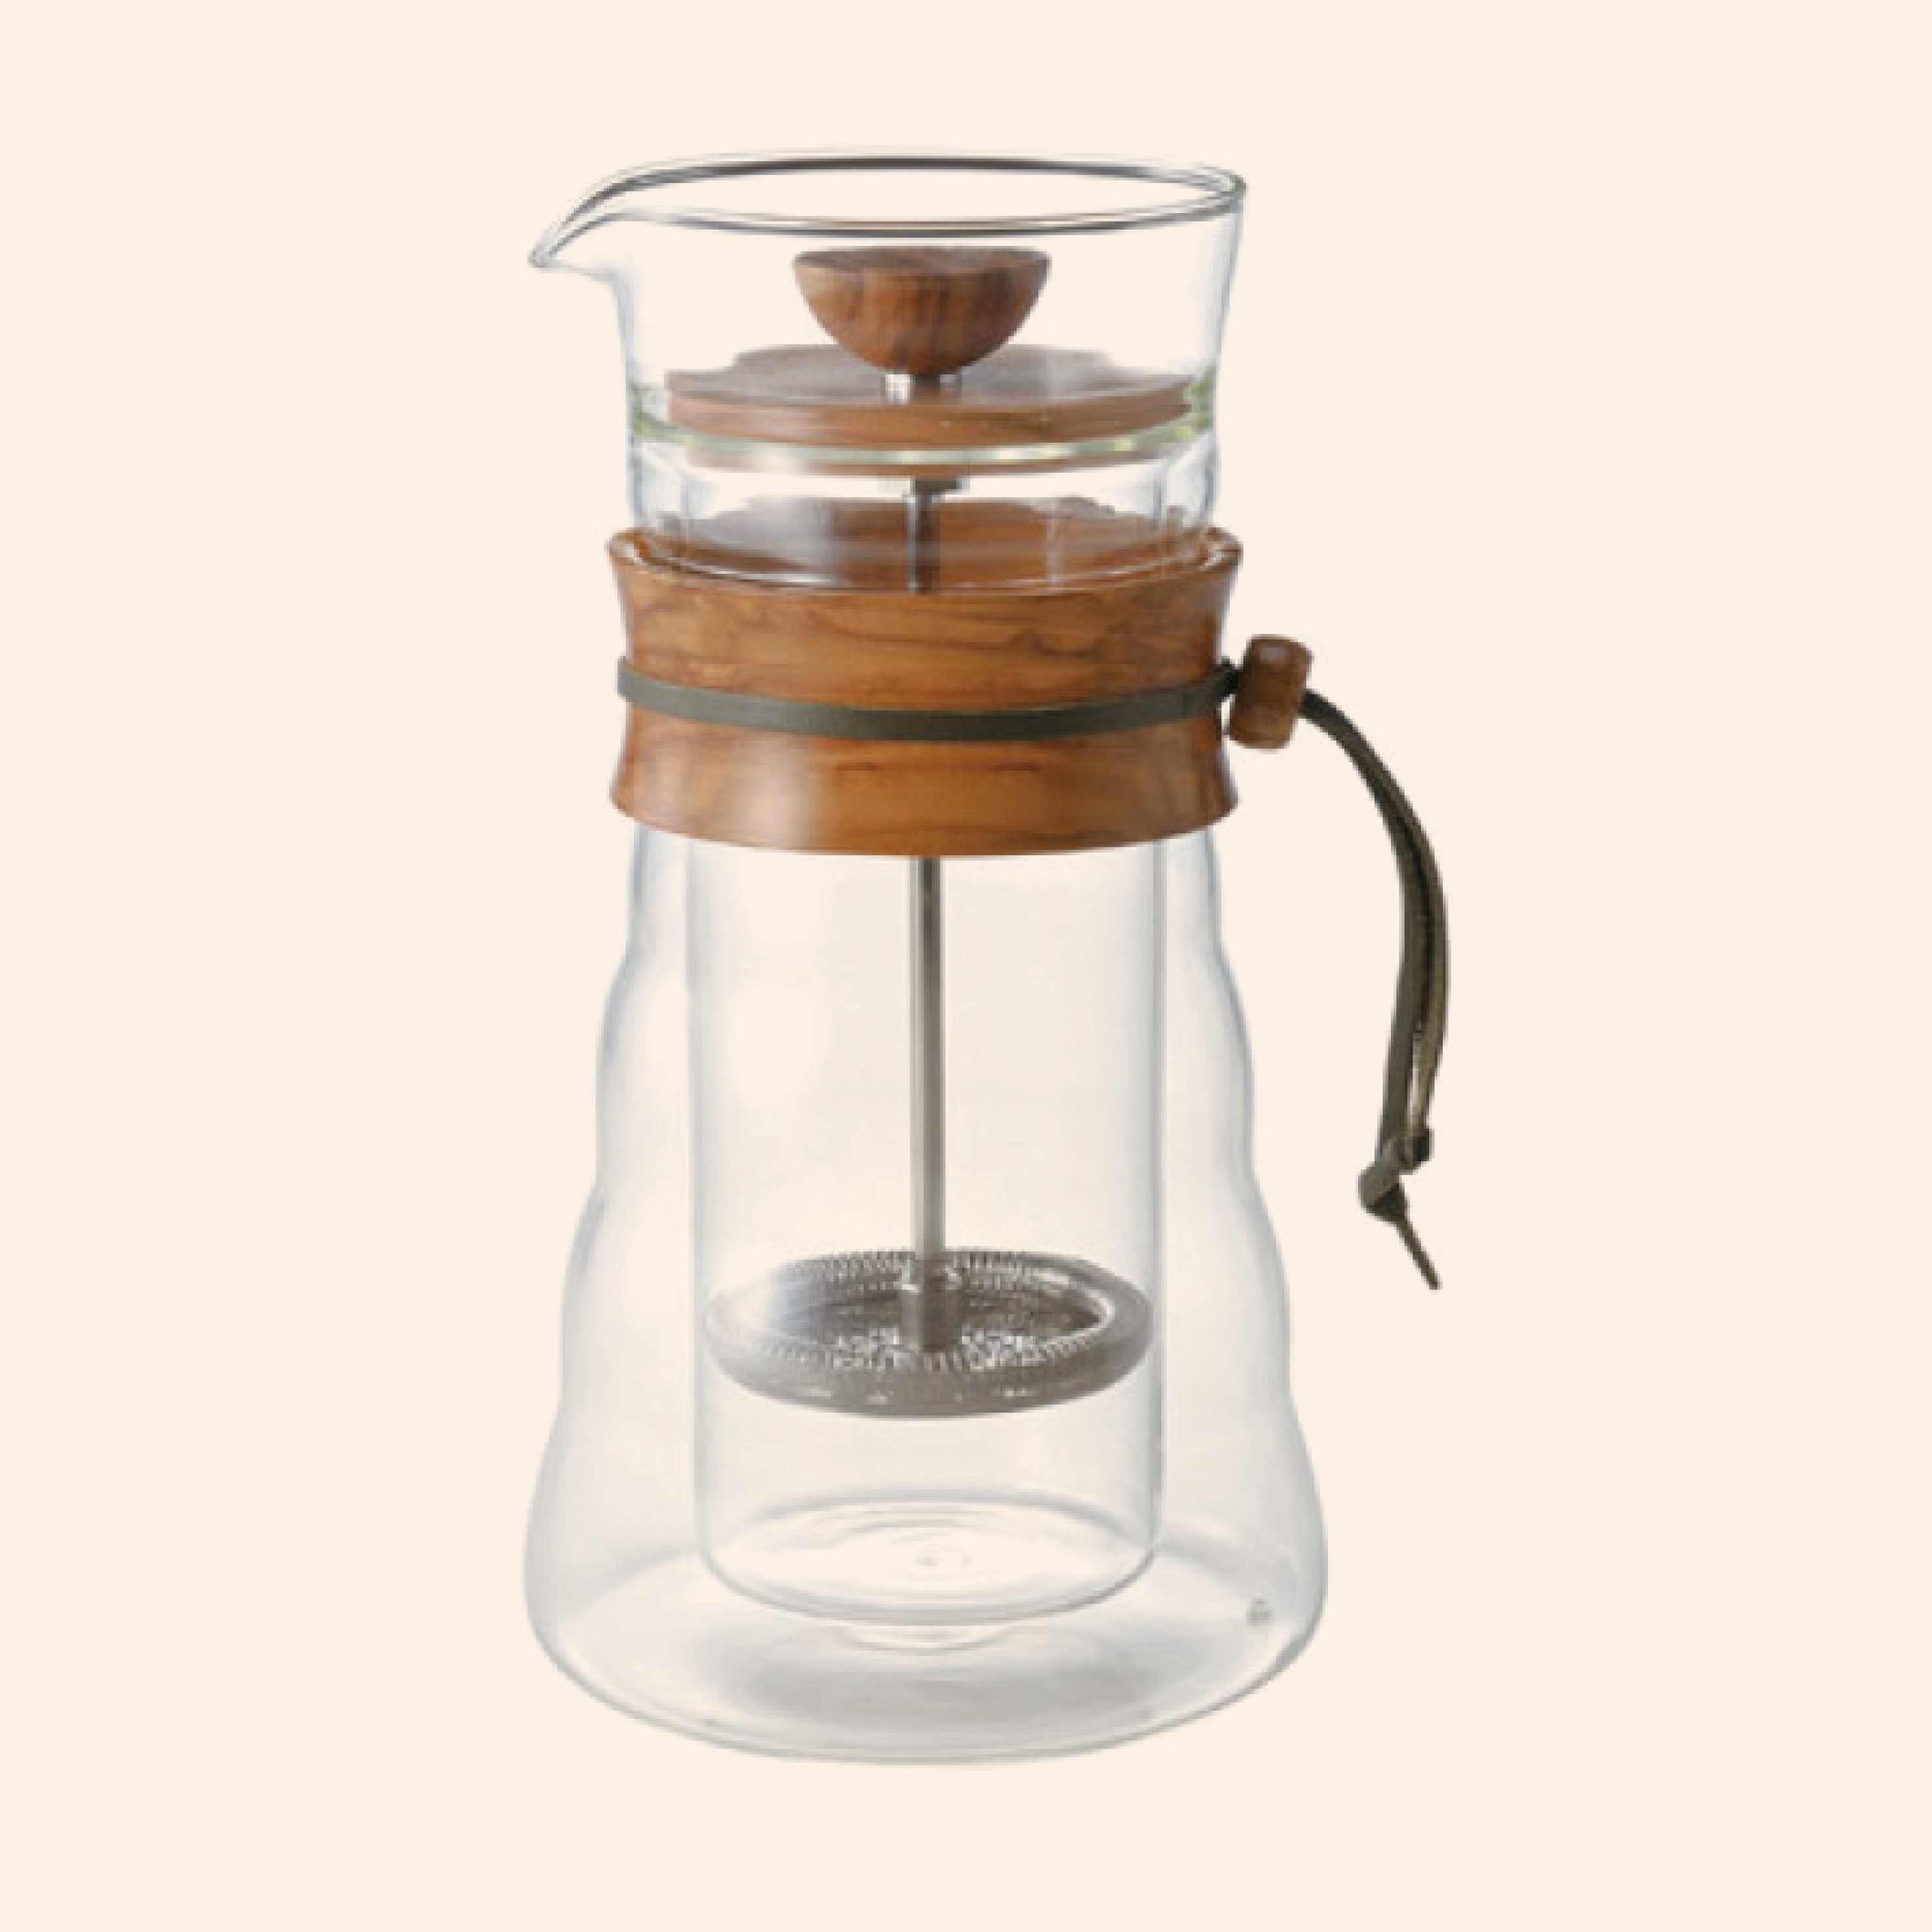 Hario Cafe Press Double Glass